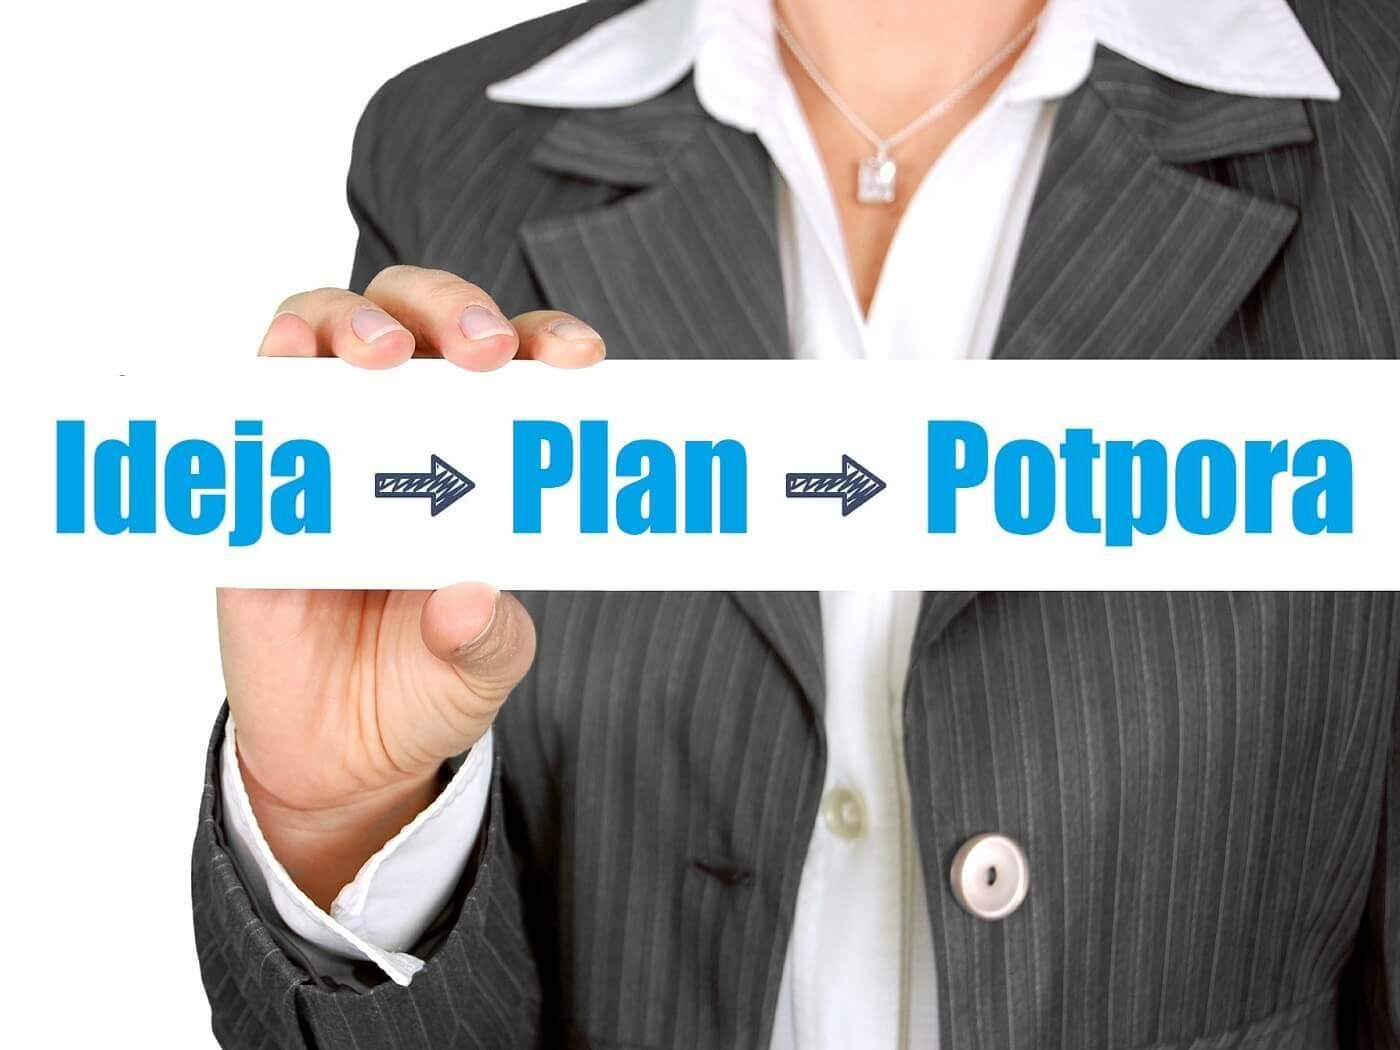 Potpora za samozapošljavanje Kako napisati poslovni plan